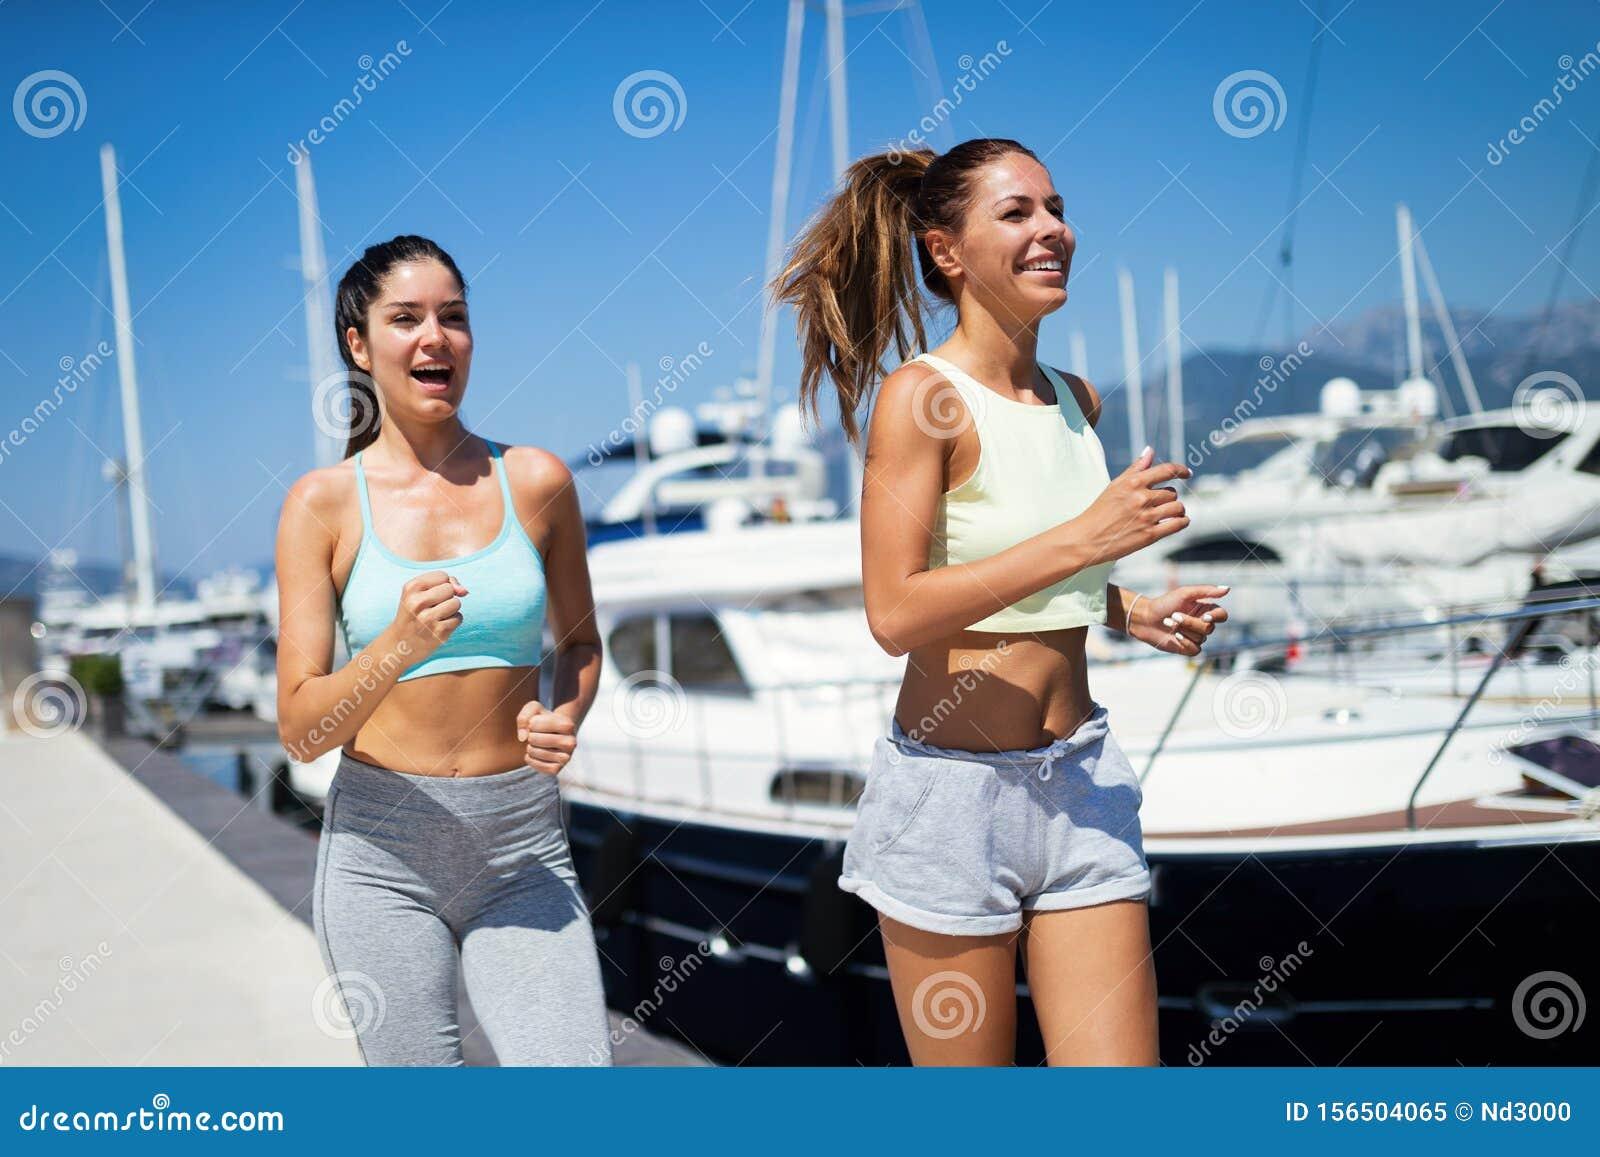 Outdoor portrait of group of happy fit women running